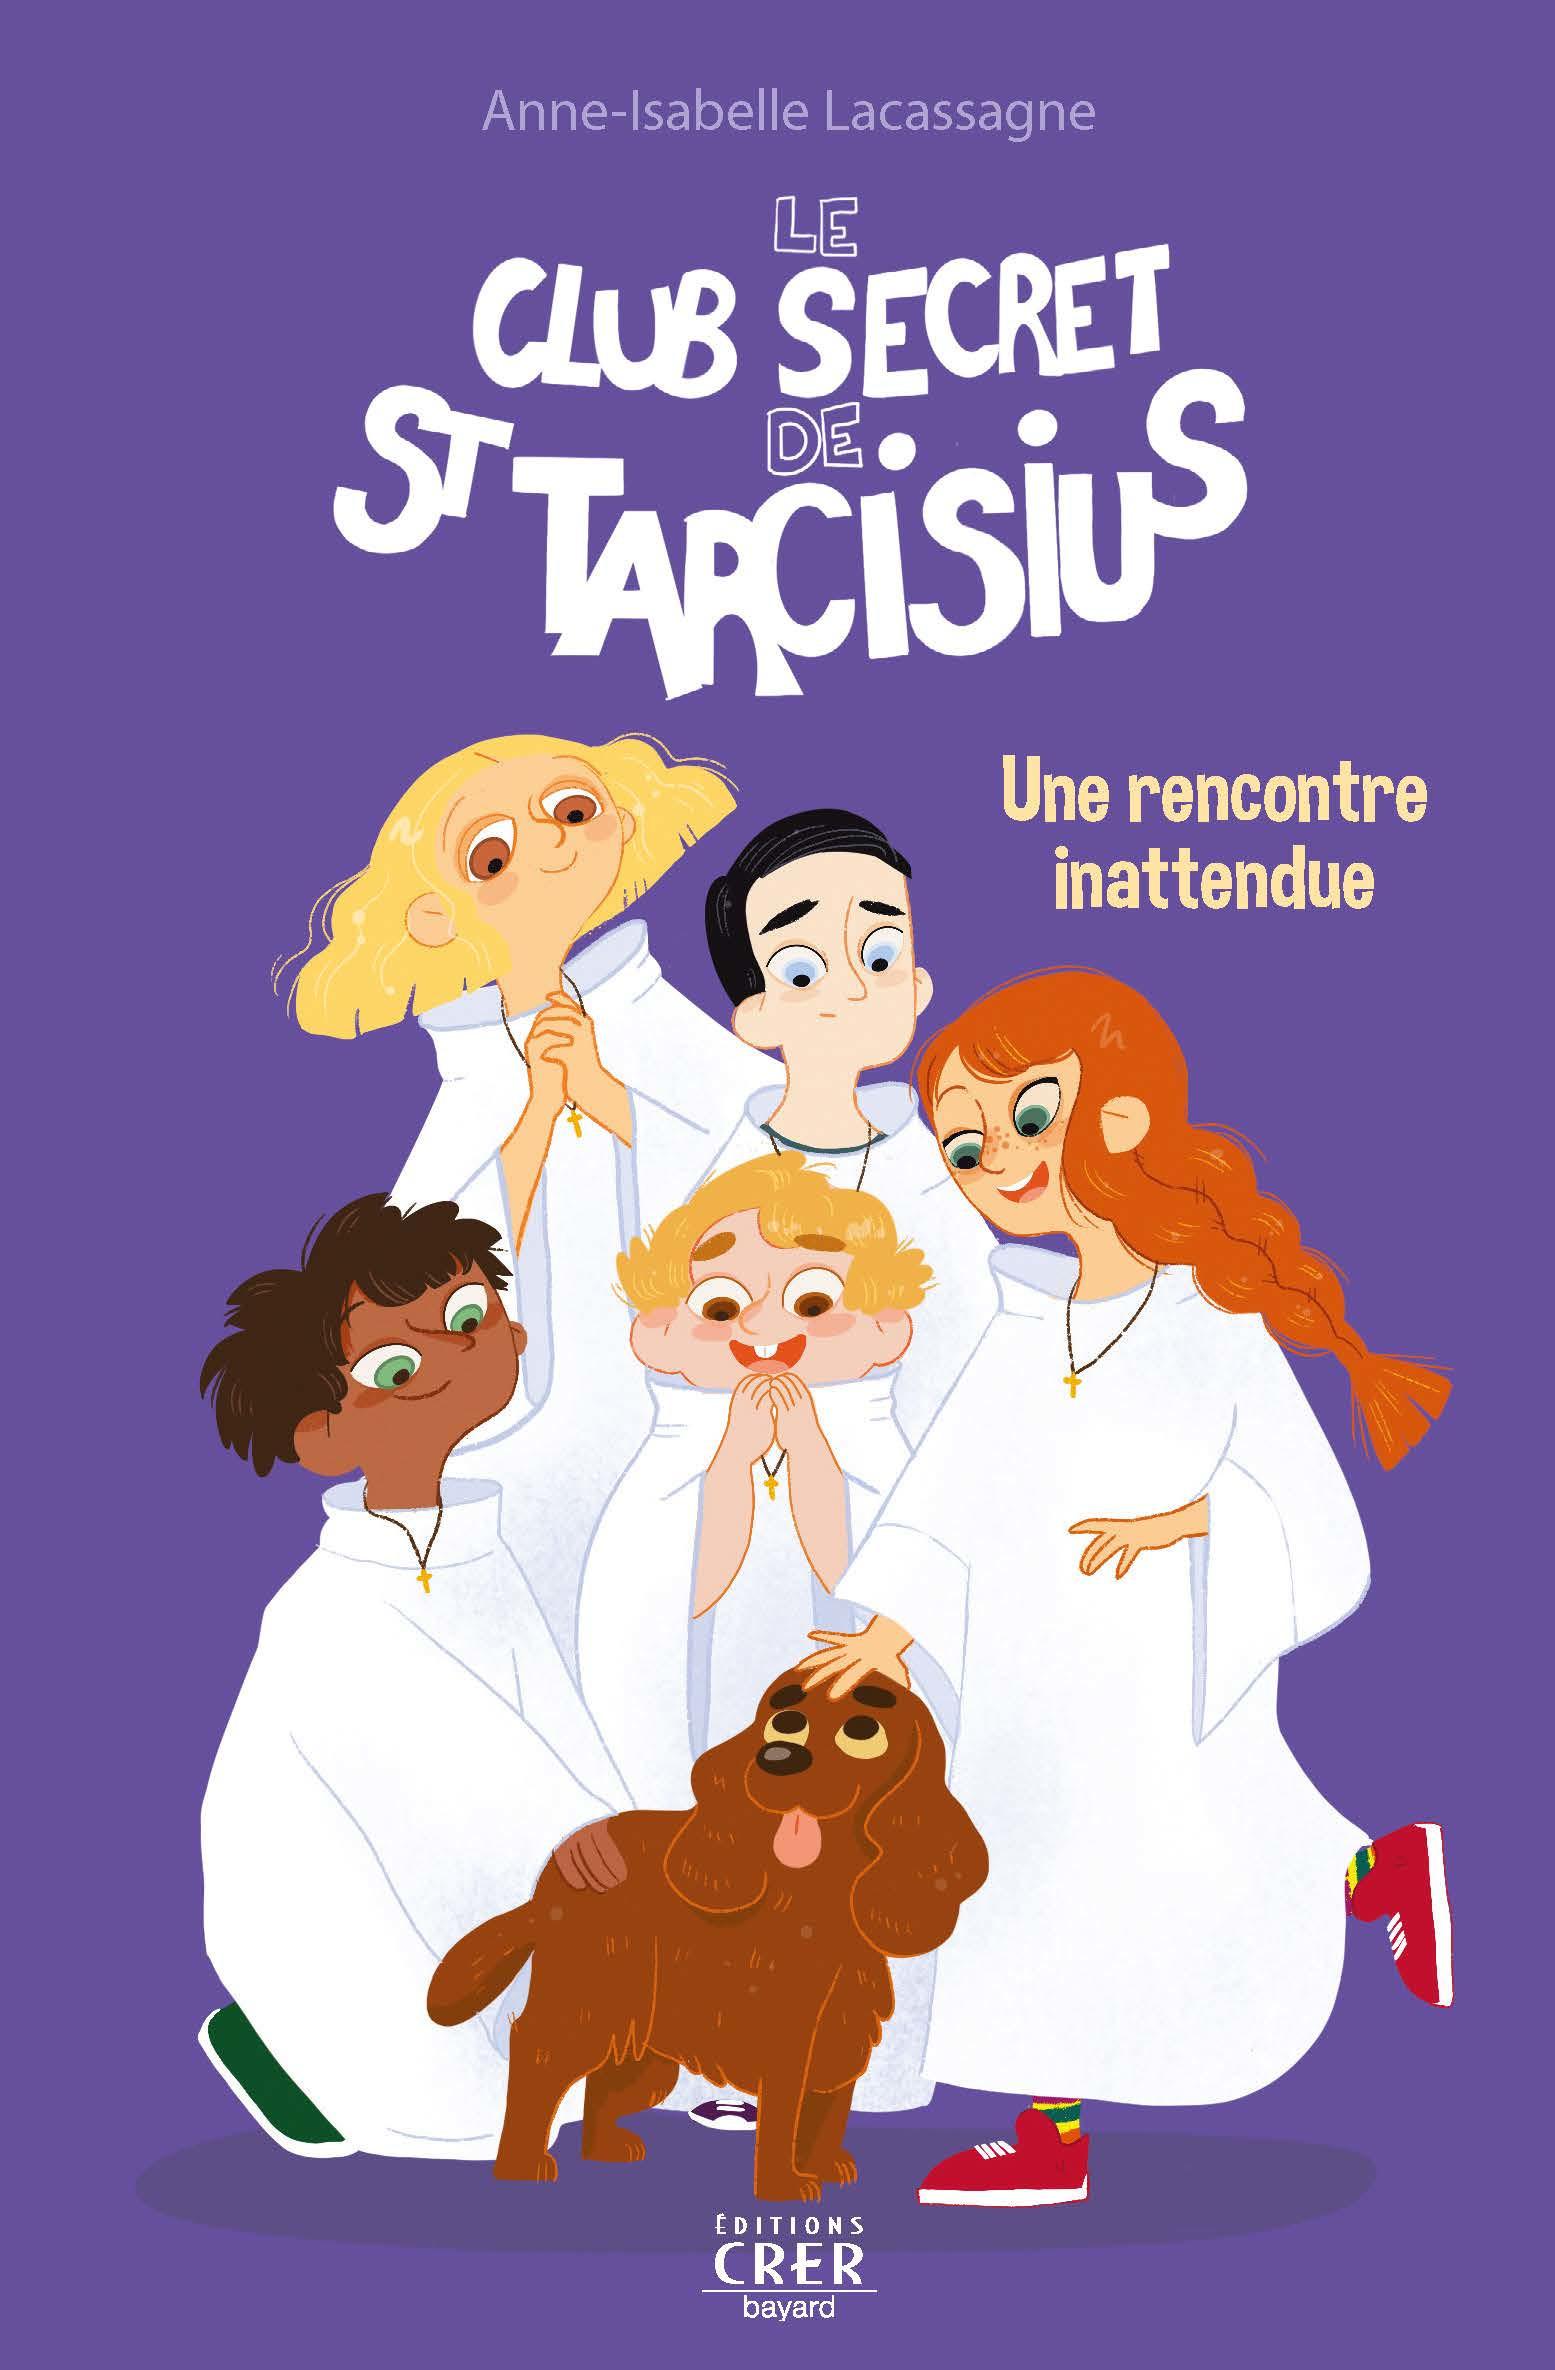 Le club secret de saint tarcisius - vol2 - une rencontre inattendue - ed.crer-bayard